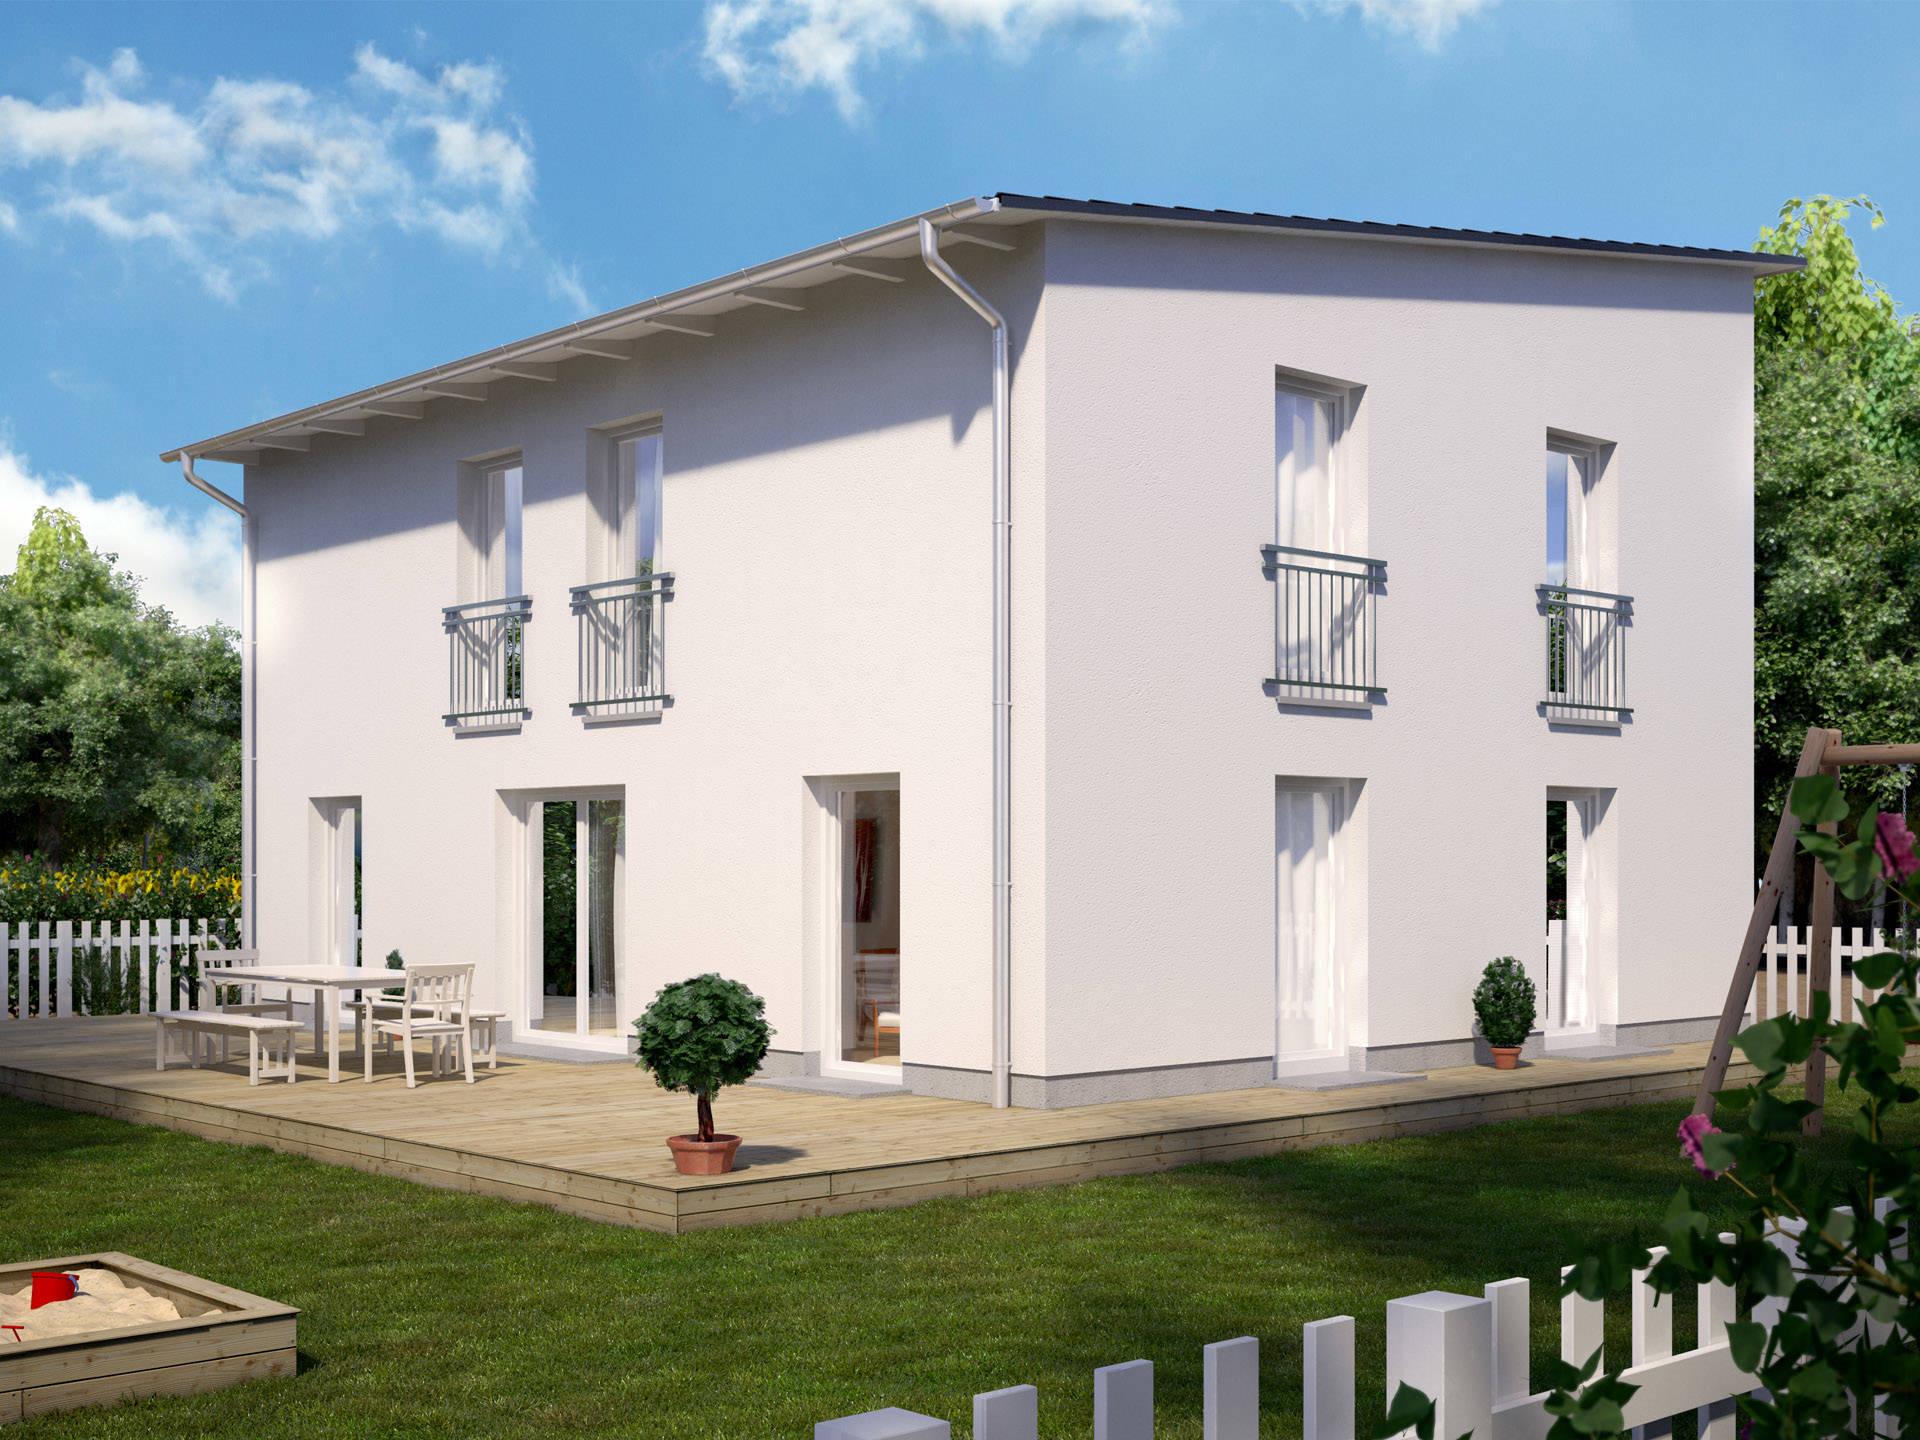 Stadtvilla modern 1000 2 bauidee wohlf hl h user for Moderne haus muster